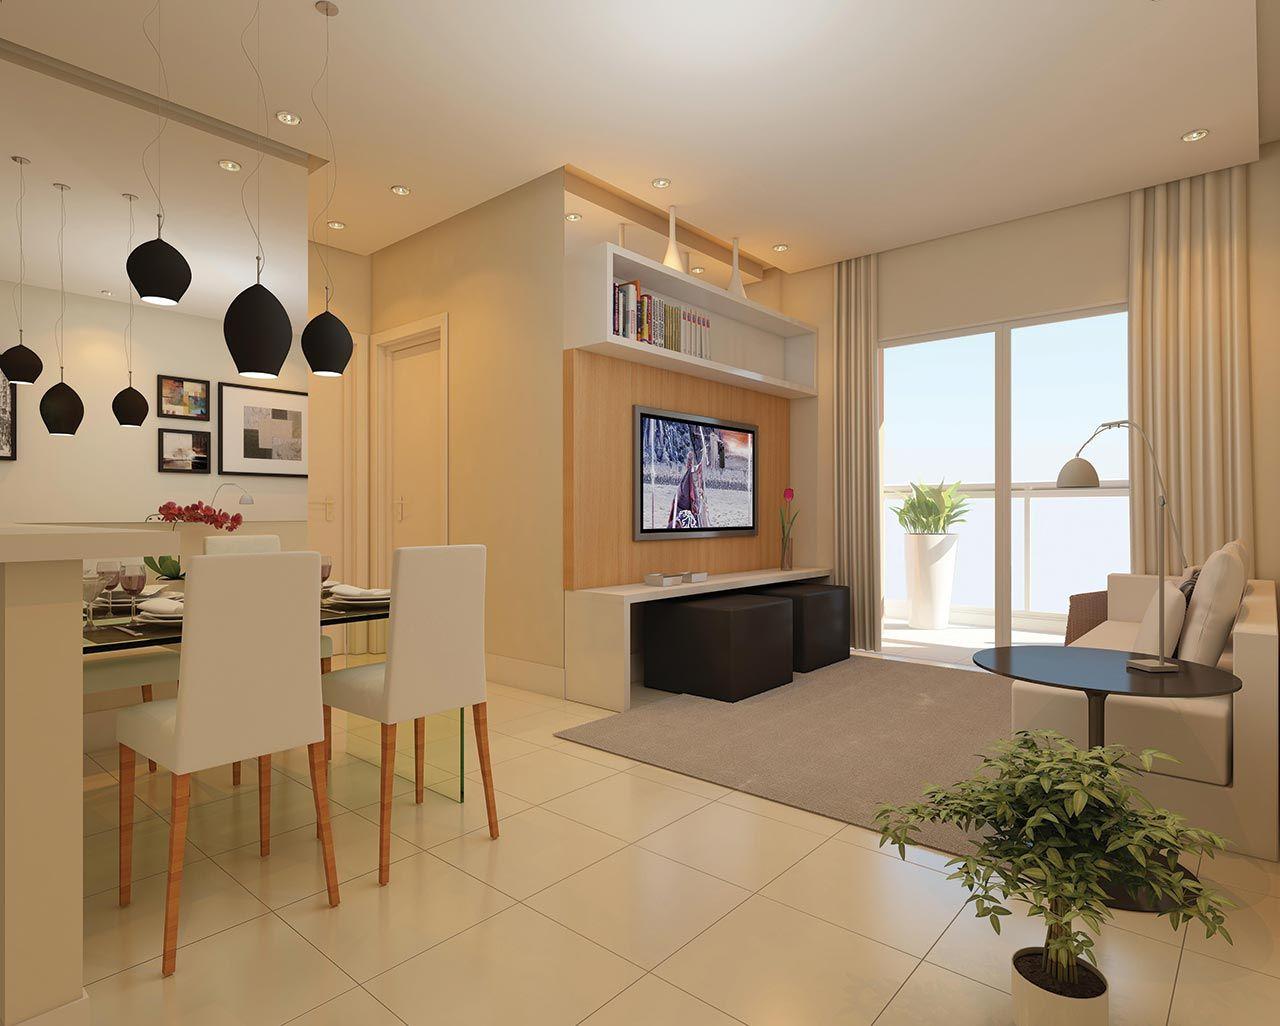 Sala De Estar Moderna Pequena ~ Salas de estar pequenas 77 belos projetos para se inspirar  Madeira